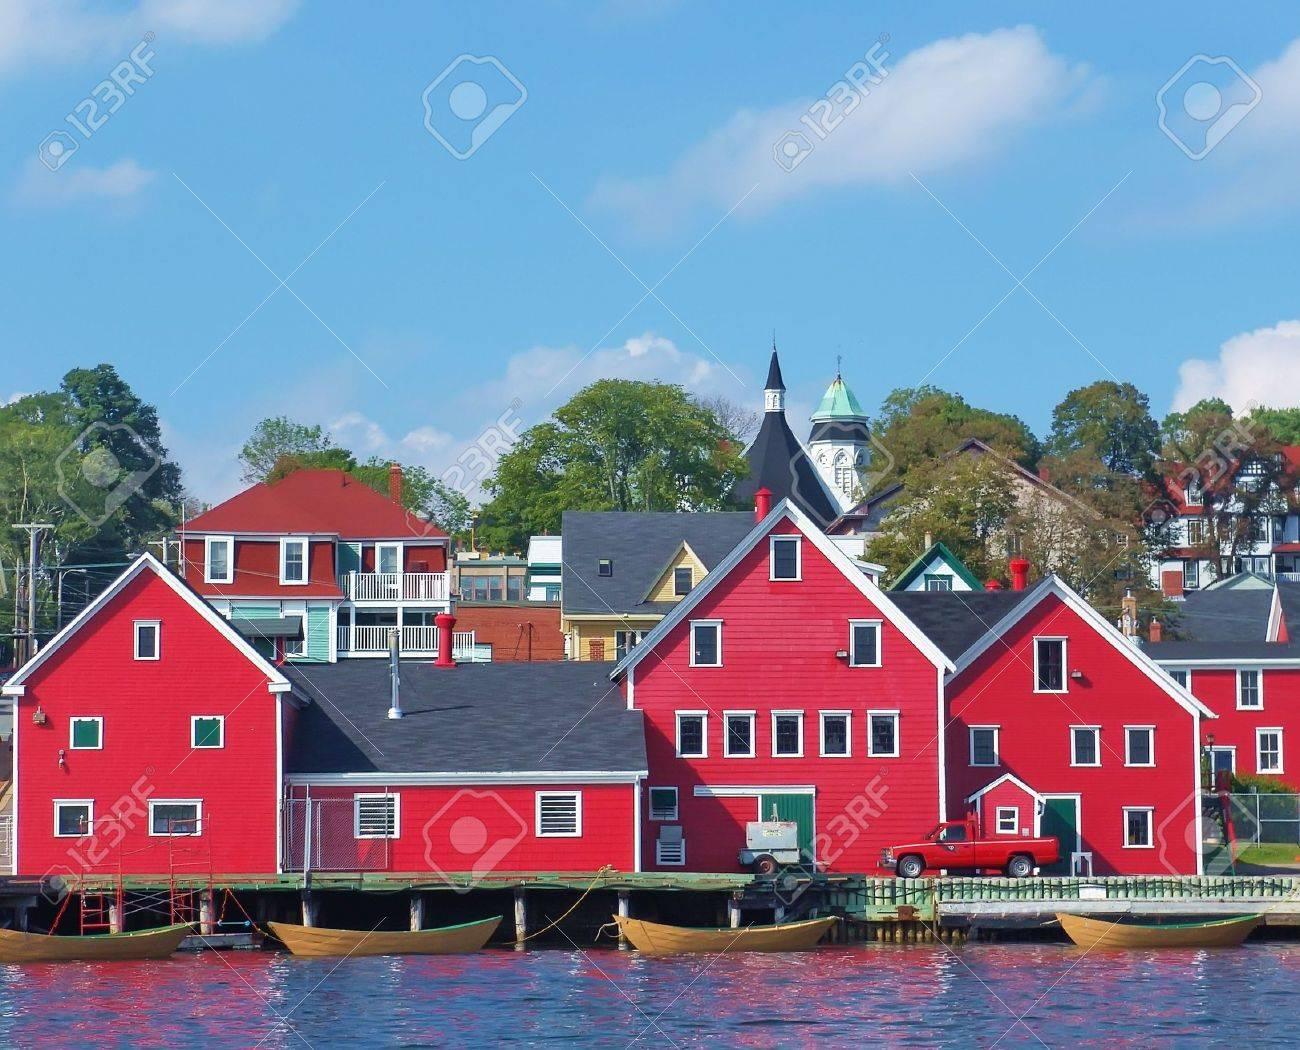 Town of Lunenburg (Nova Scotia, Canada) - UNESCO World Heritage Site - 2899181